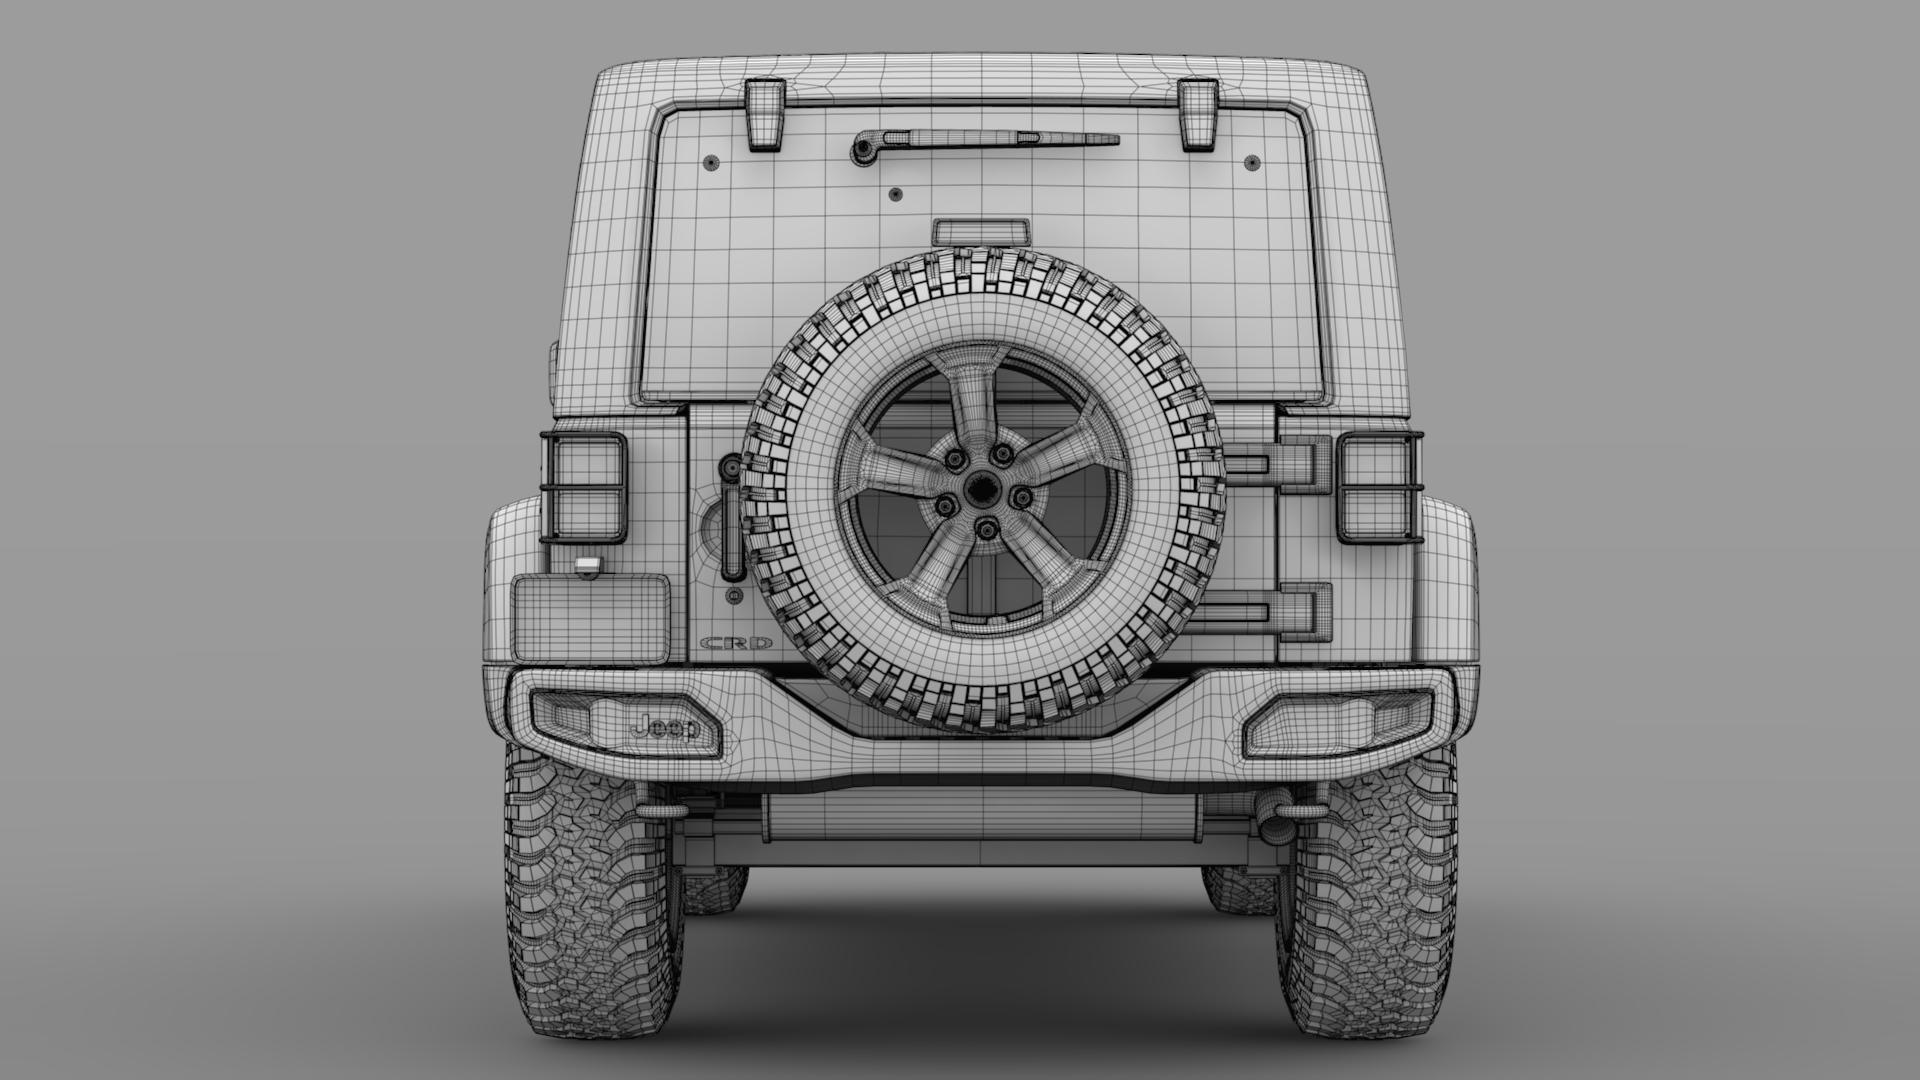 jeep wrangler unlimited rubicon recon jk 2017 3d model max fbx c4d lwo ma mb hrc xsi obj 277012